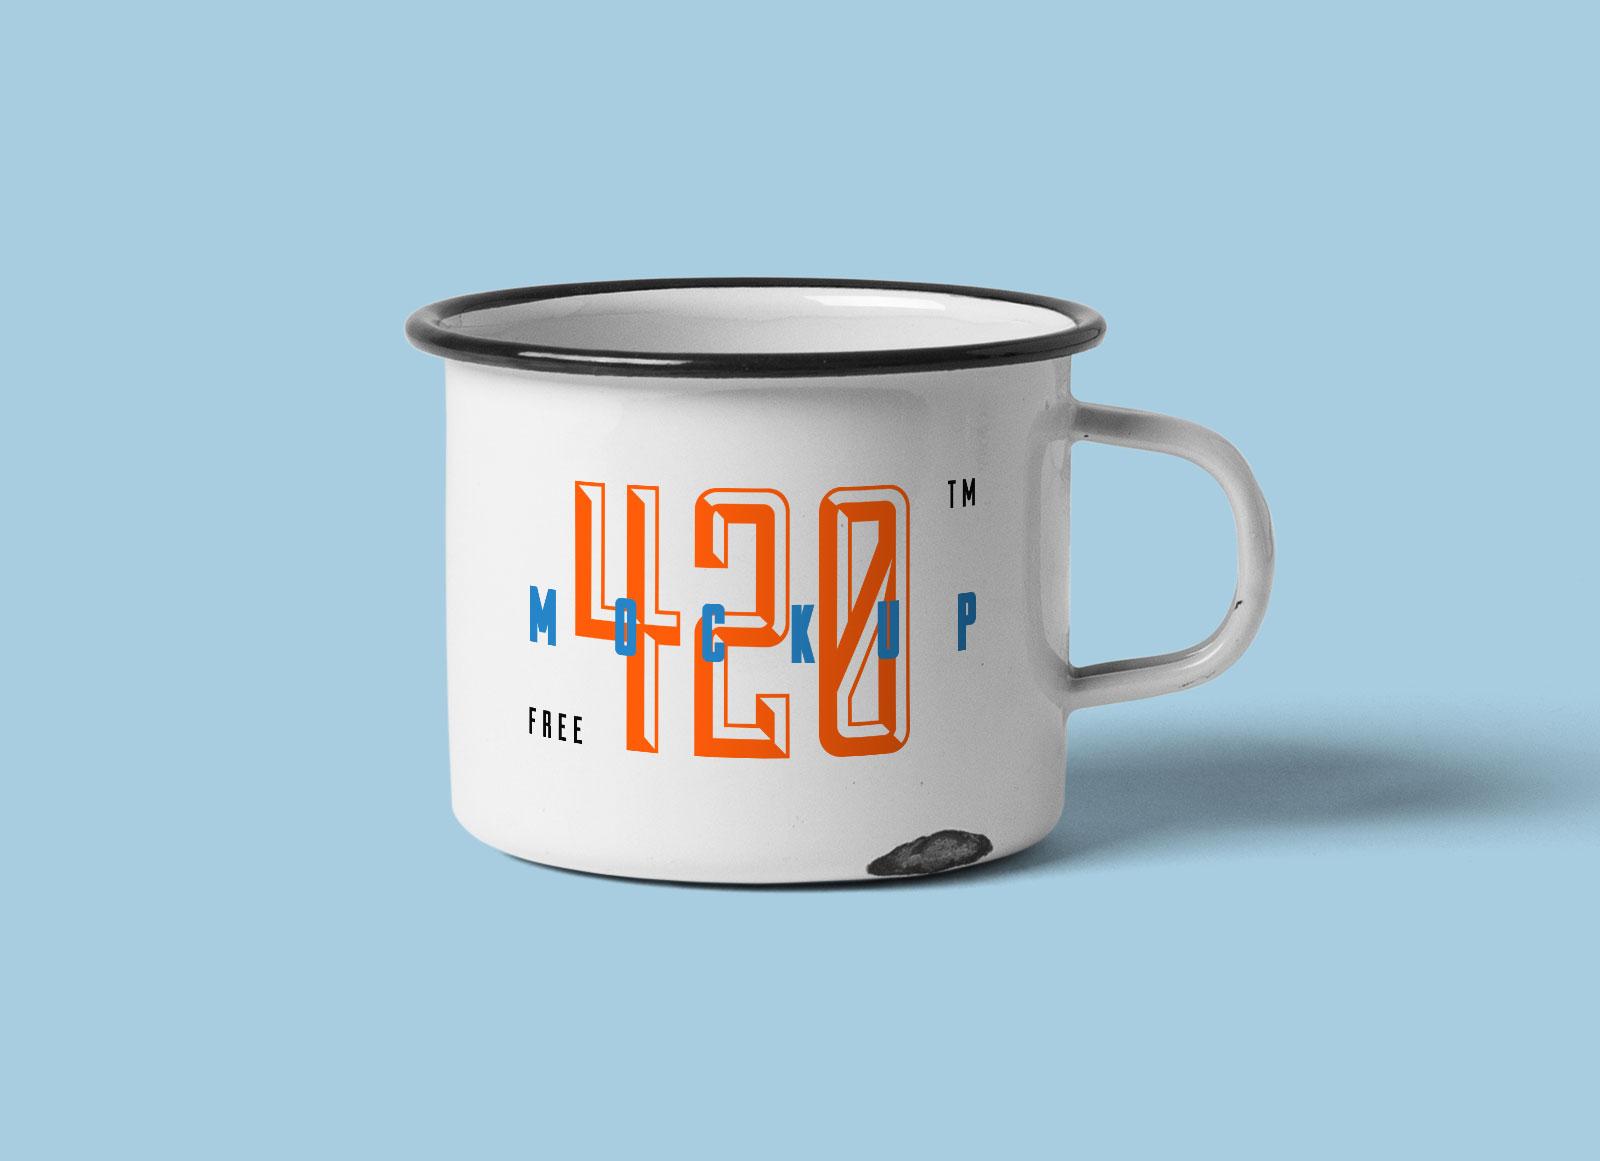 Free-Metal-Coffee-Mug-Mockup-PSD